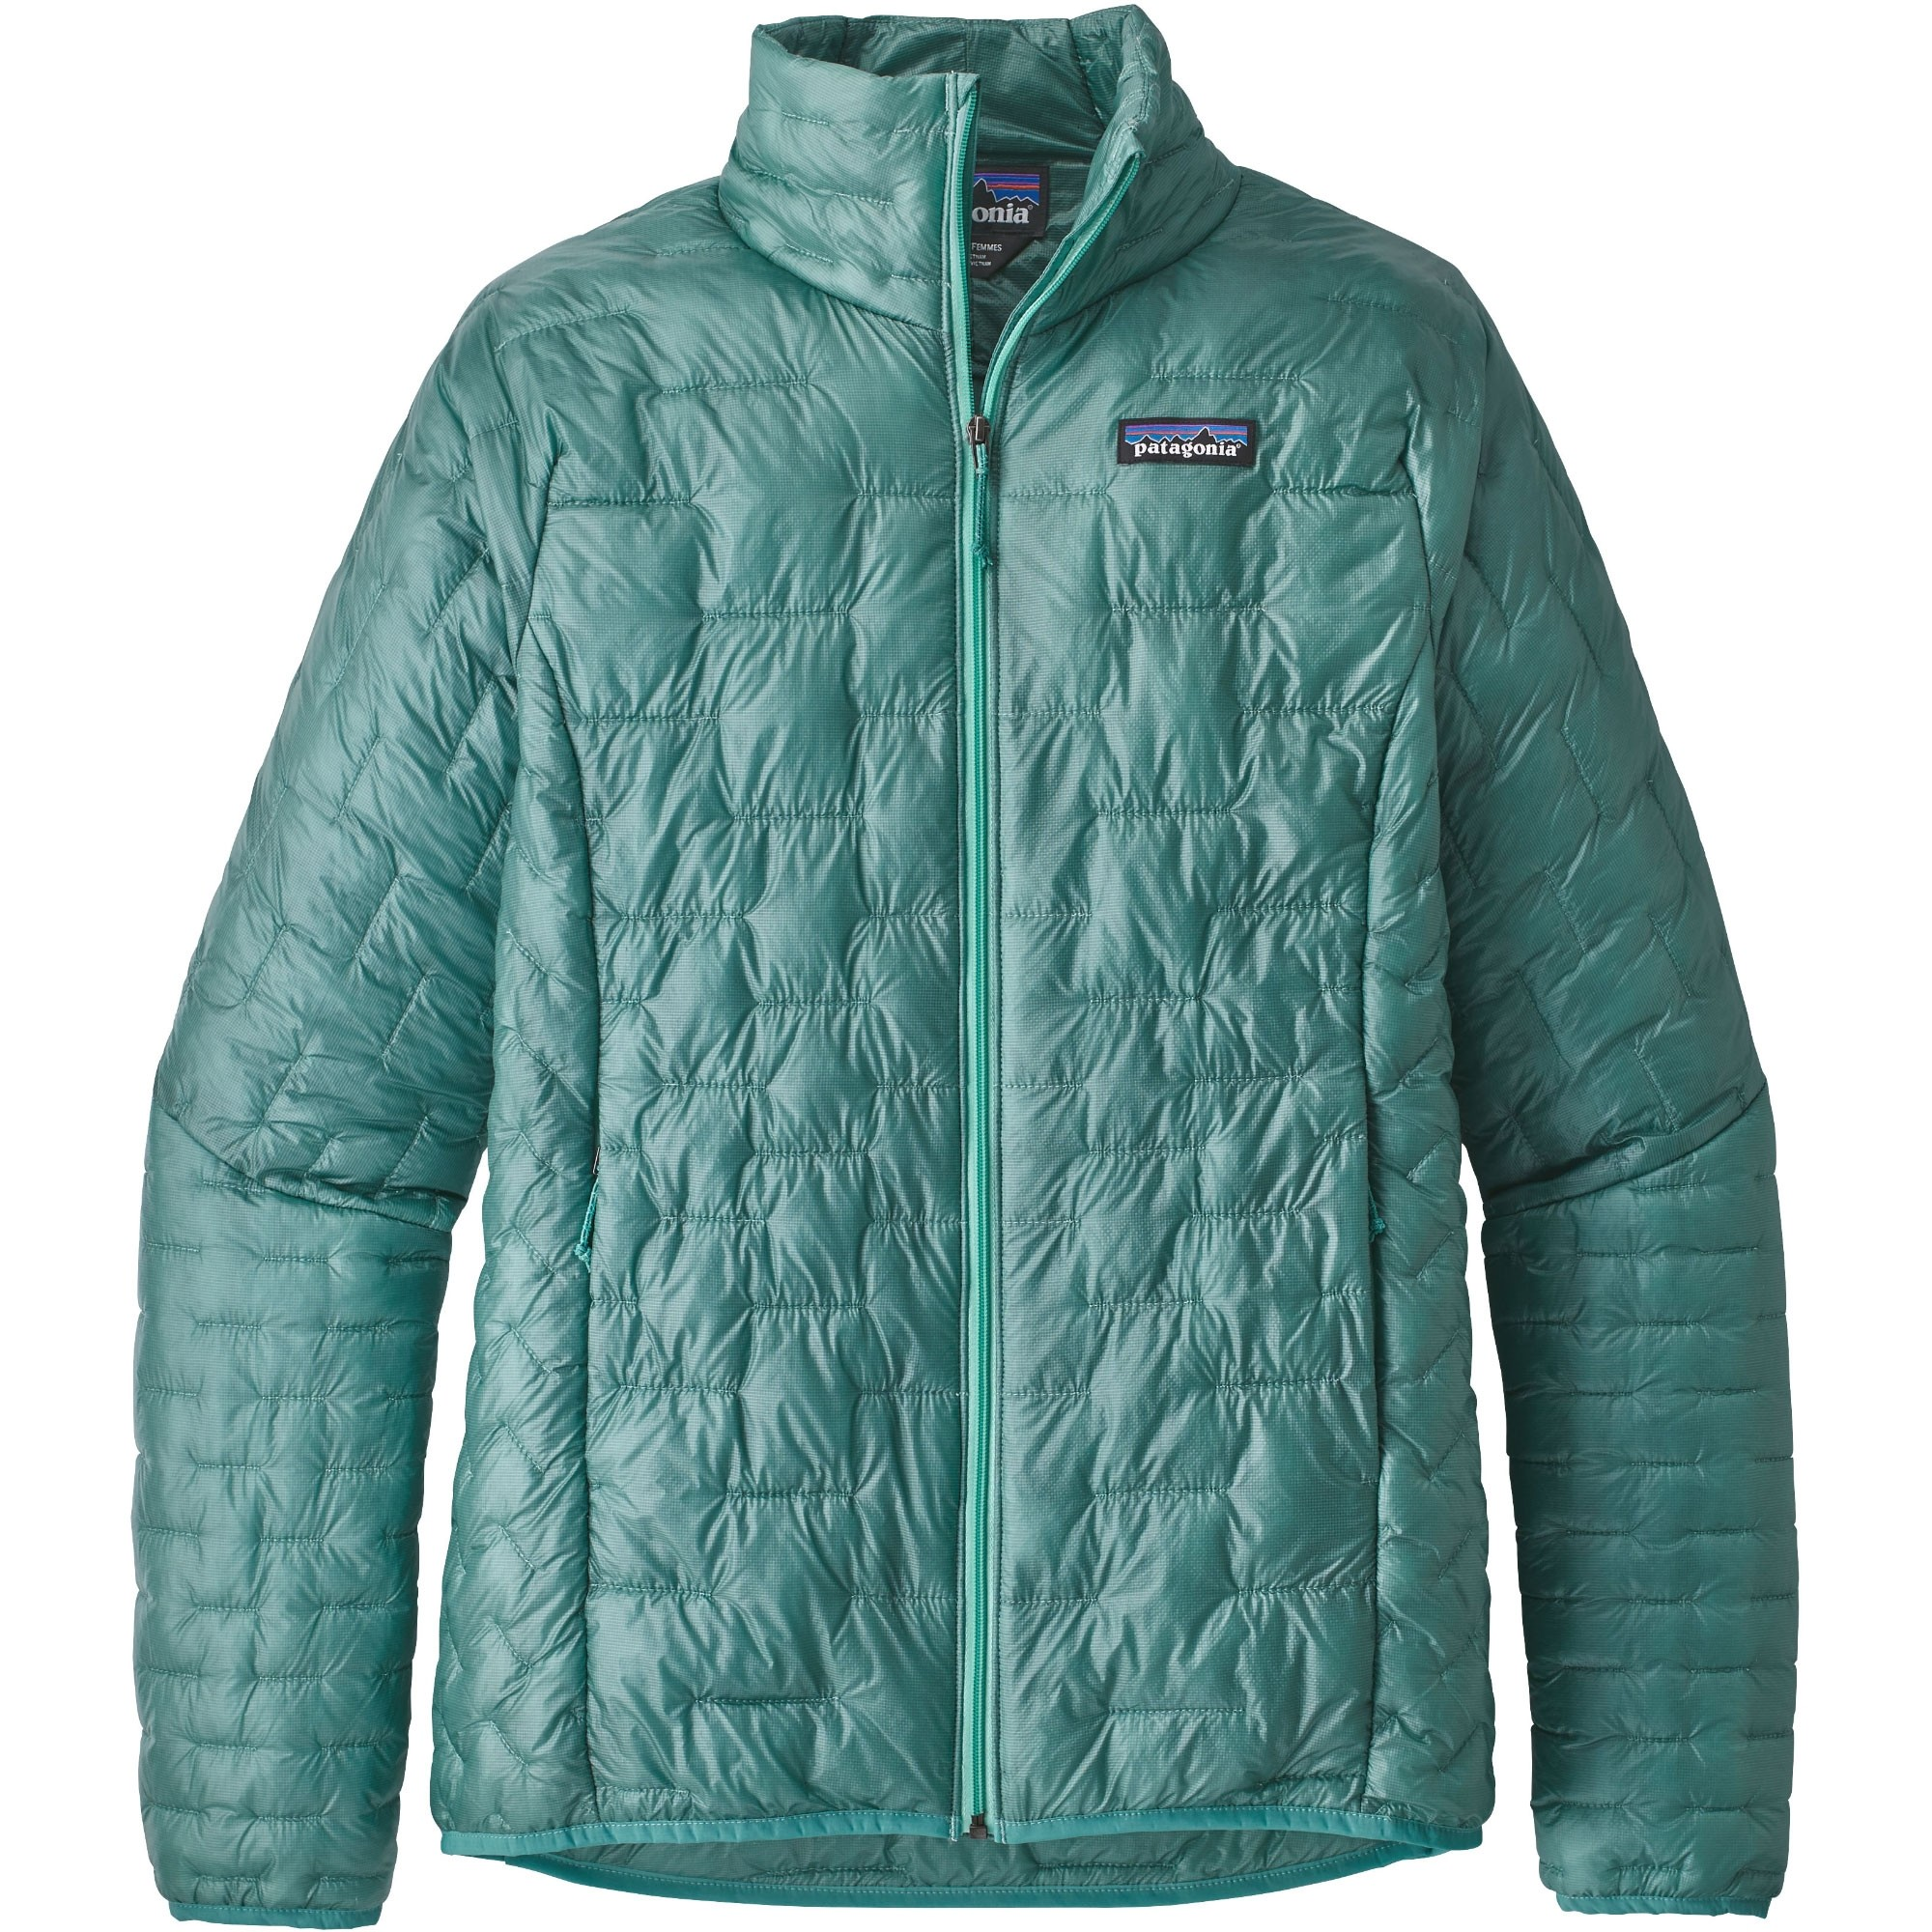 Patagonia Women's Micro Puff Jacket - Beryl Green